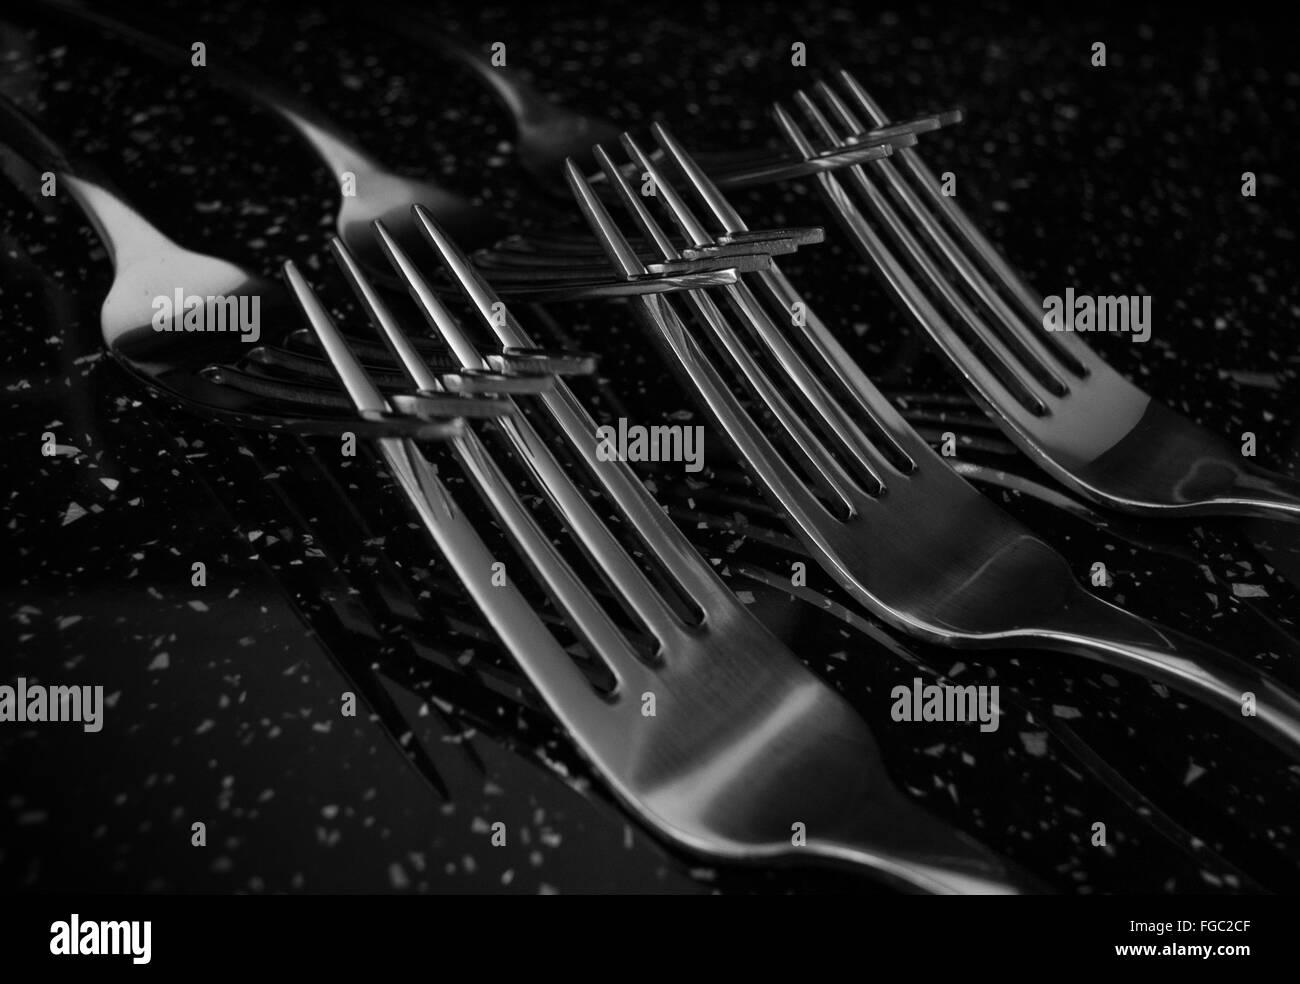 Plan de traversée Forks On Table Photo Stock